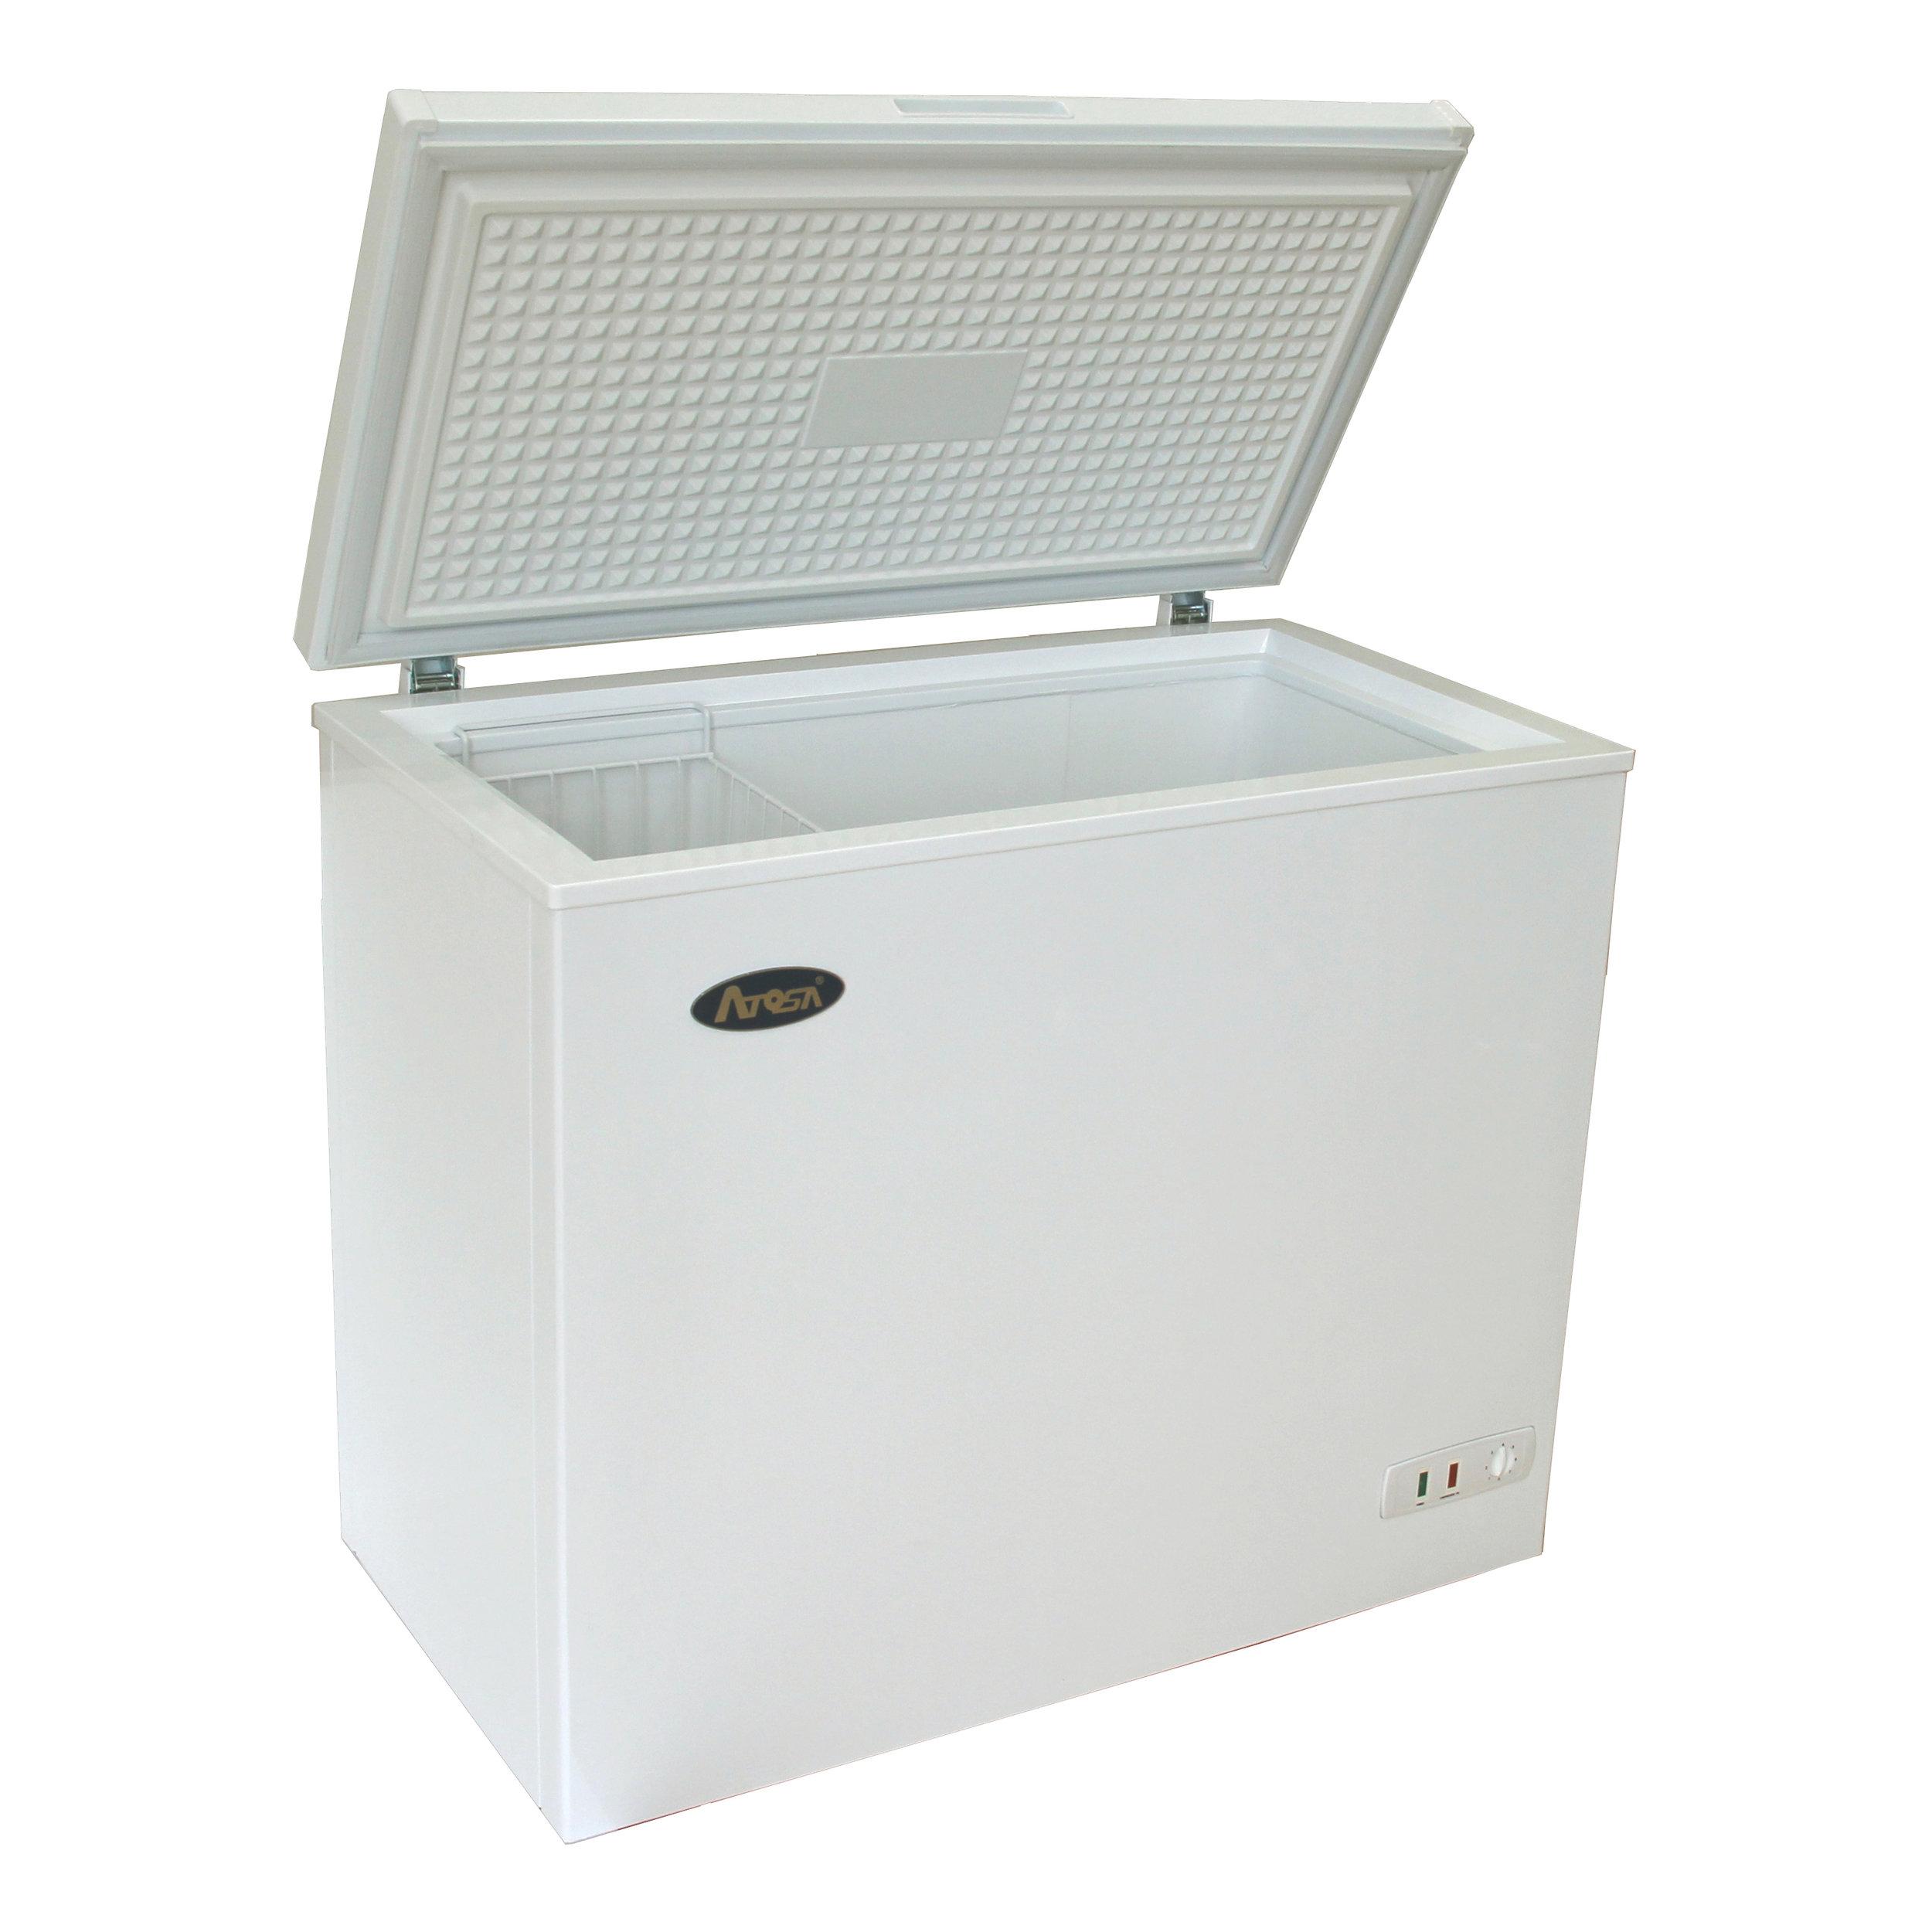 Chest-Freezer-MWF-9007-1.jpg